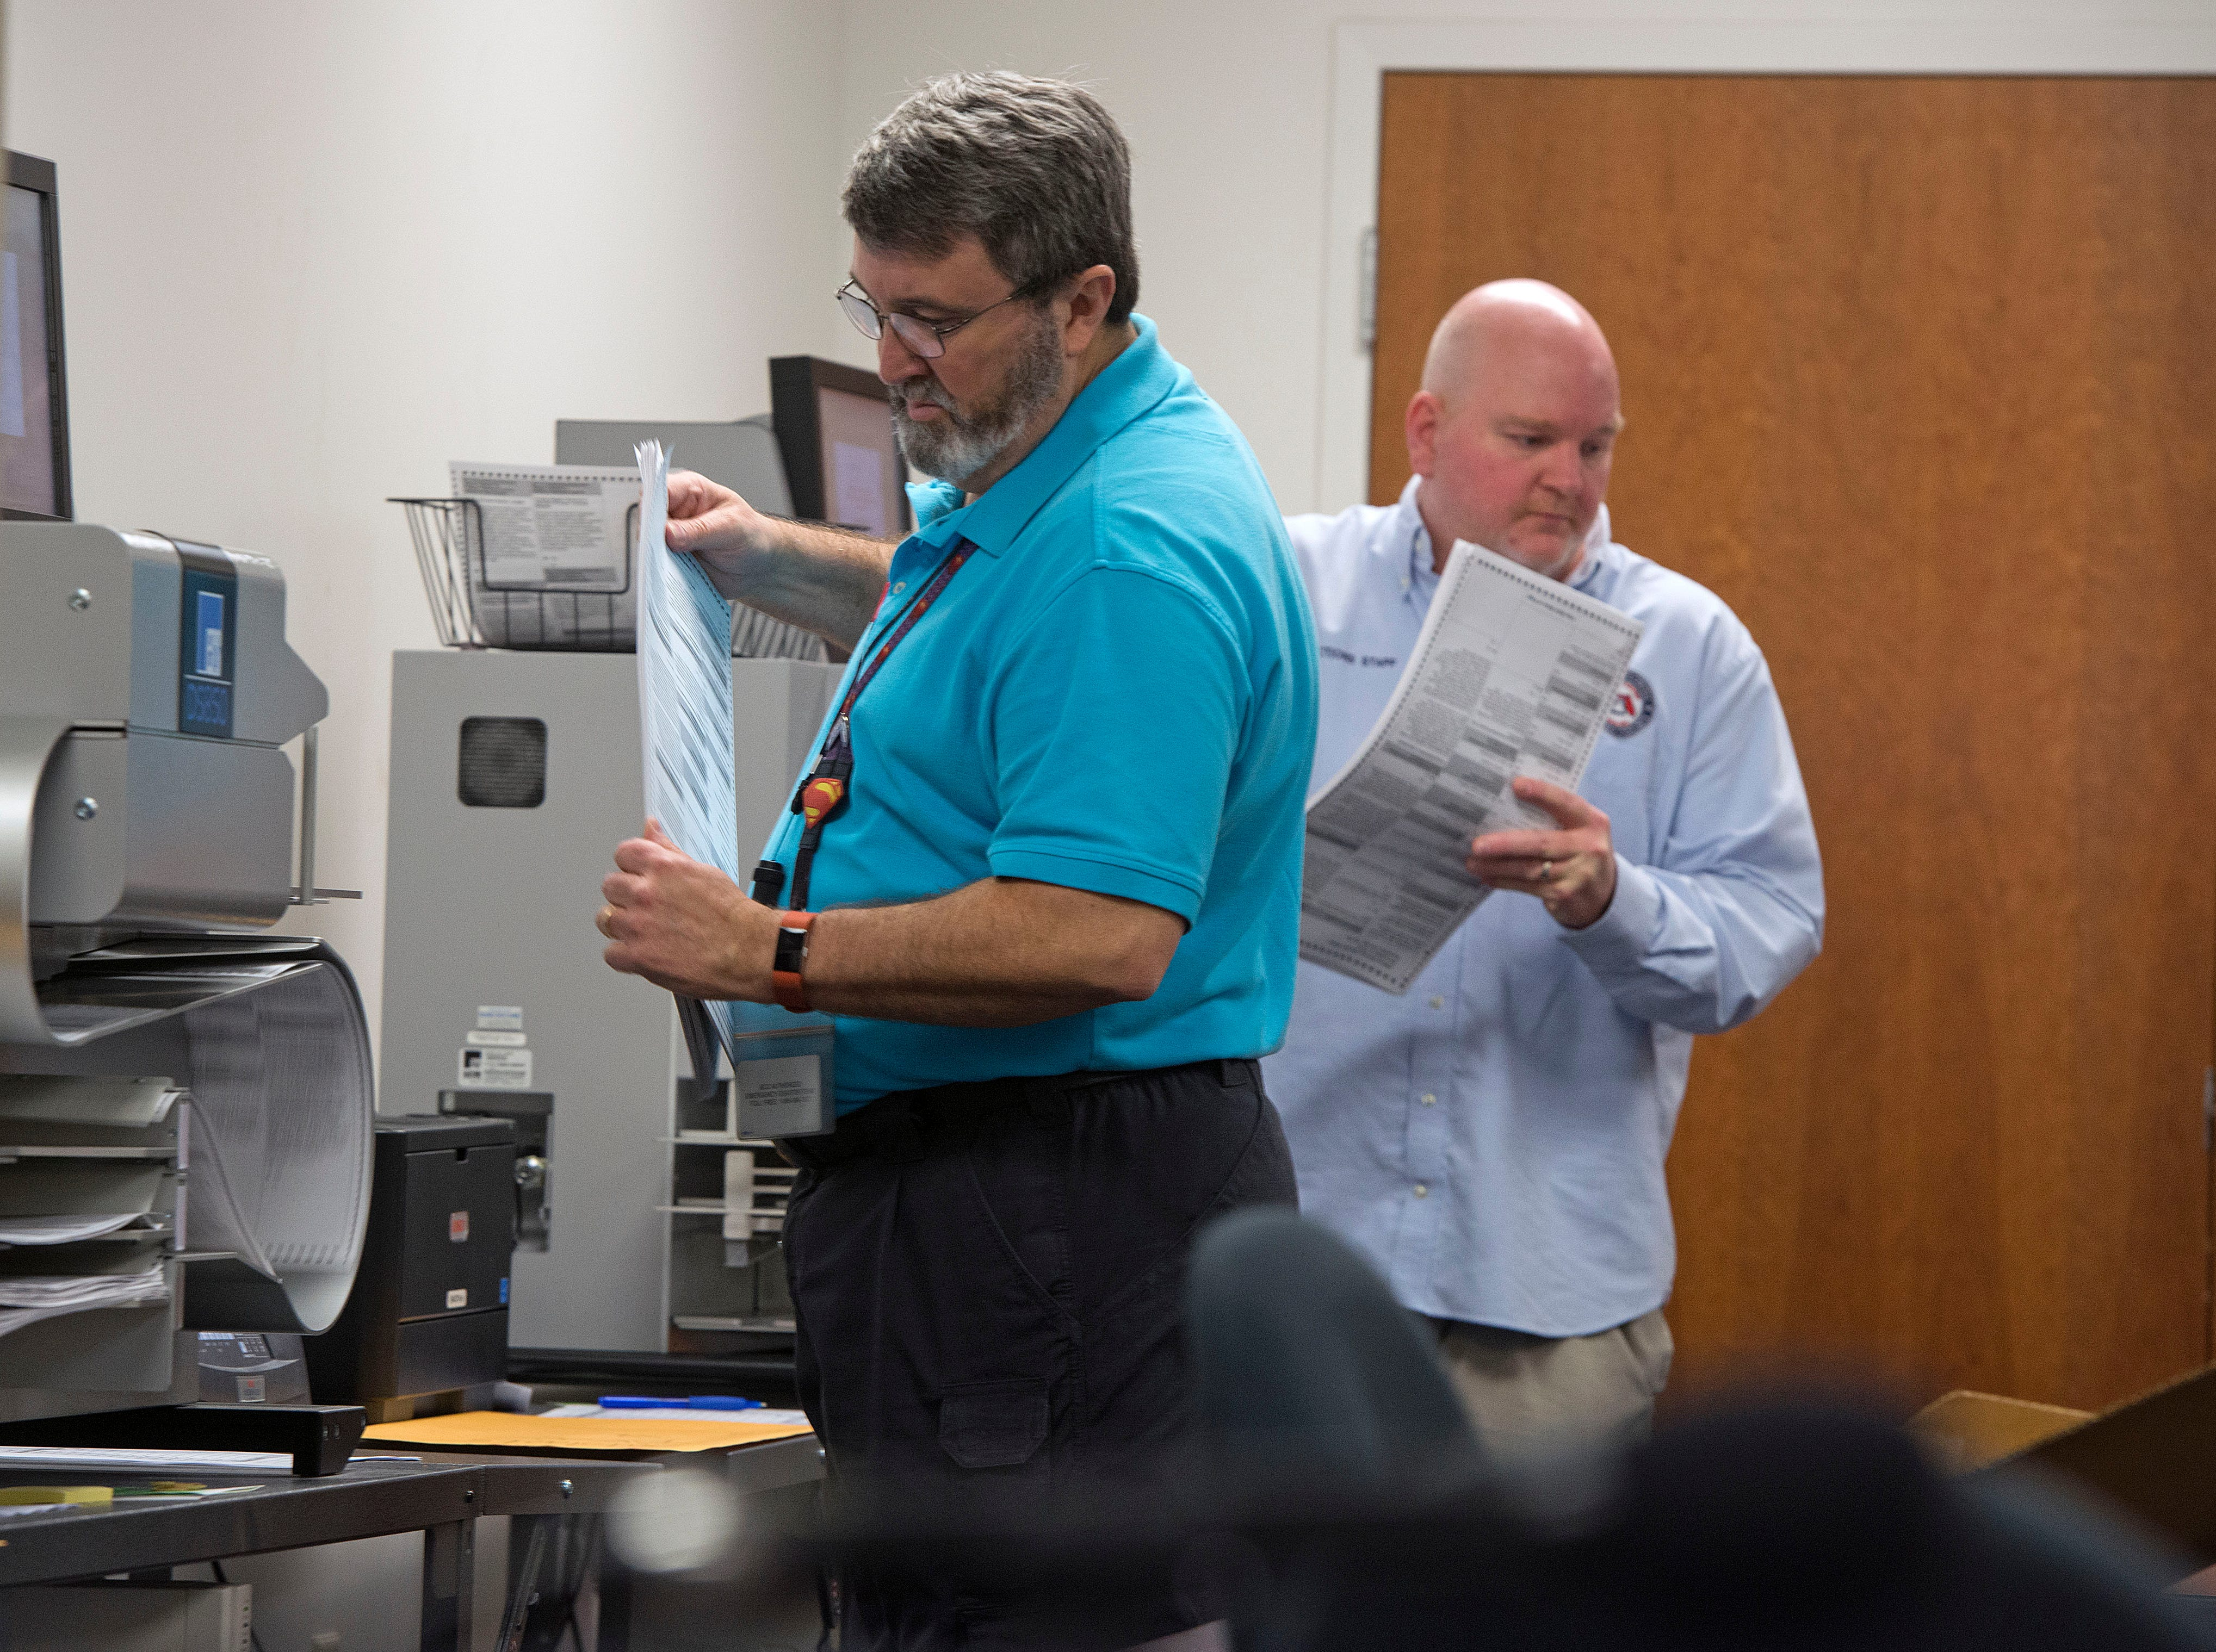 PHOTOS: Escambia County Supervisor of Elections David Stafford starts recount